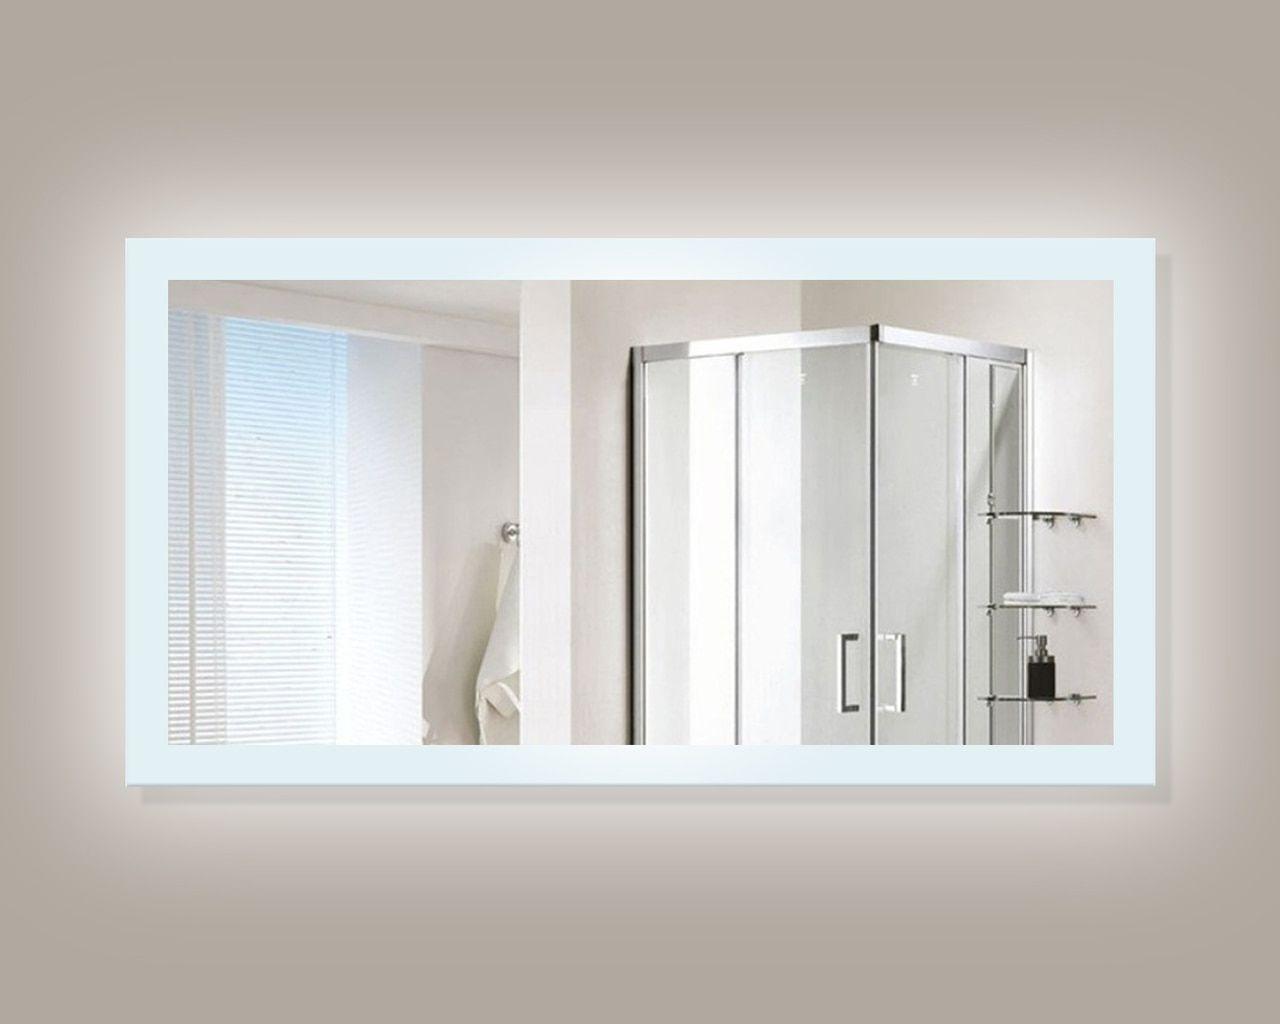 Encore LED Illuminated Bathroom Mirror | Bathroom mirrors, Glass ...